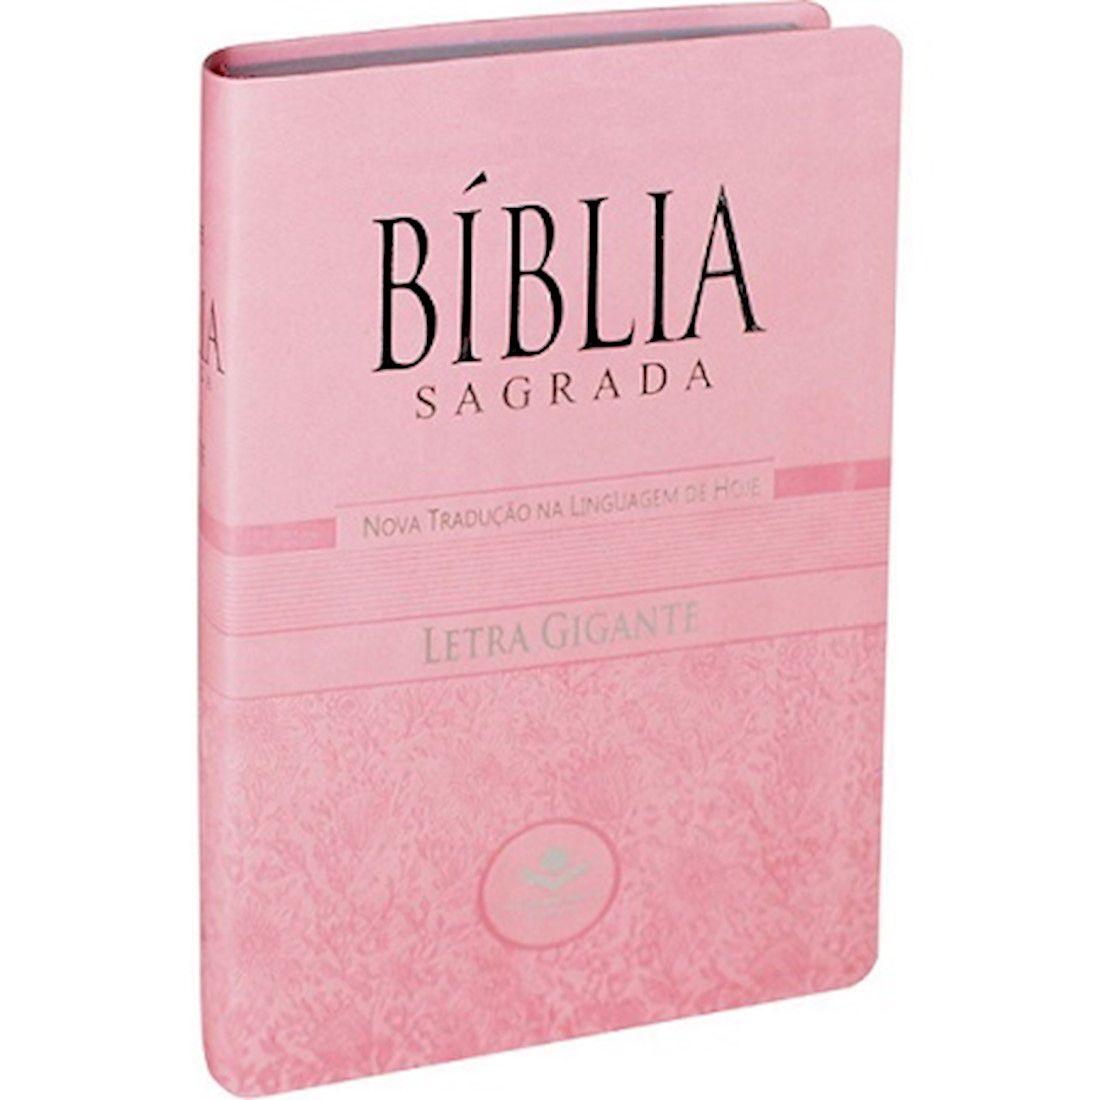 Bíblia Sagrada com Letra Gigante NTLH